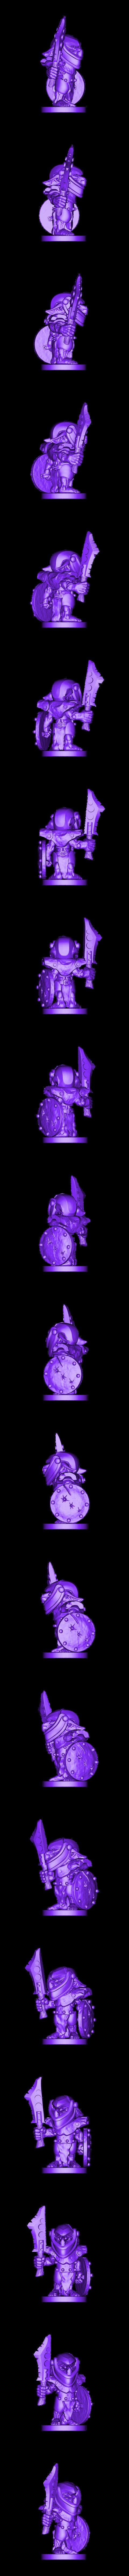 Armoured_Goblin3.stl Download free STL file Armoured Goblins • 3D printer model, duncanshadow